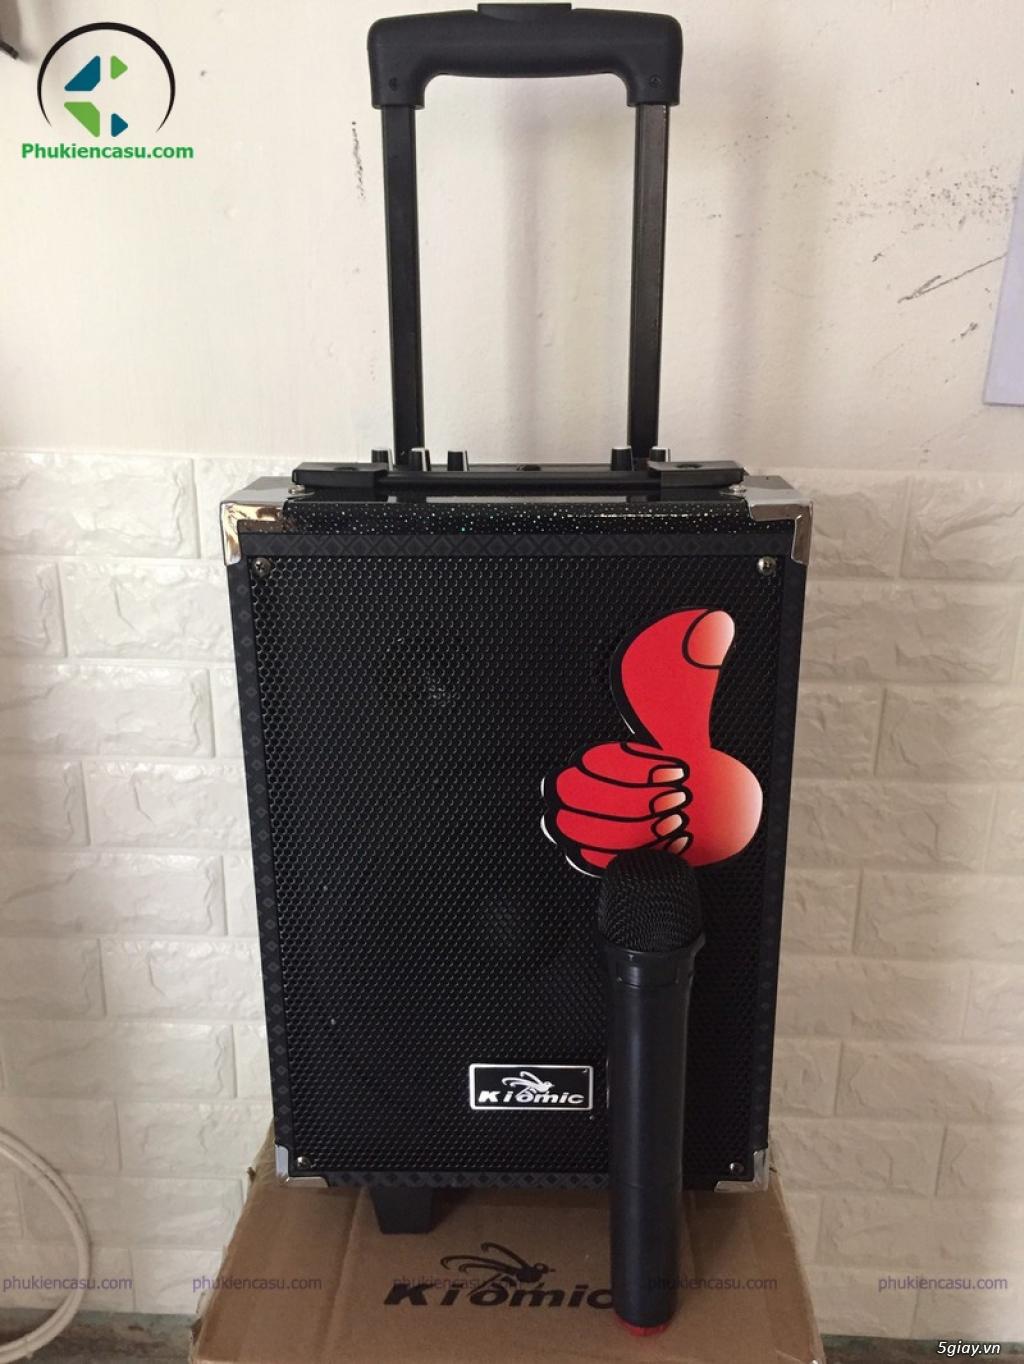 Loa karaoke Kiomic Q8 tặng micro không dây loa kéo mini - 2